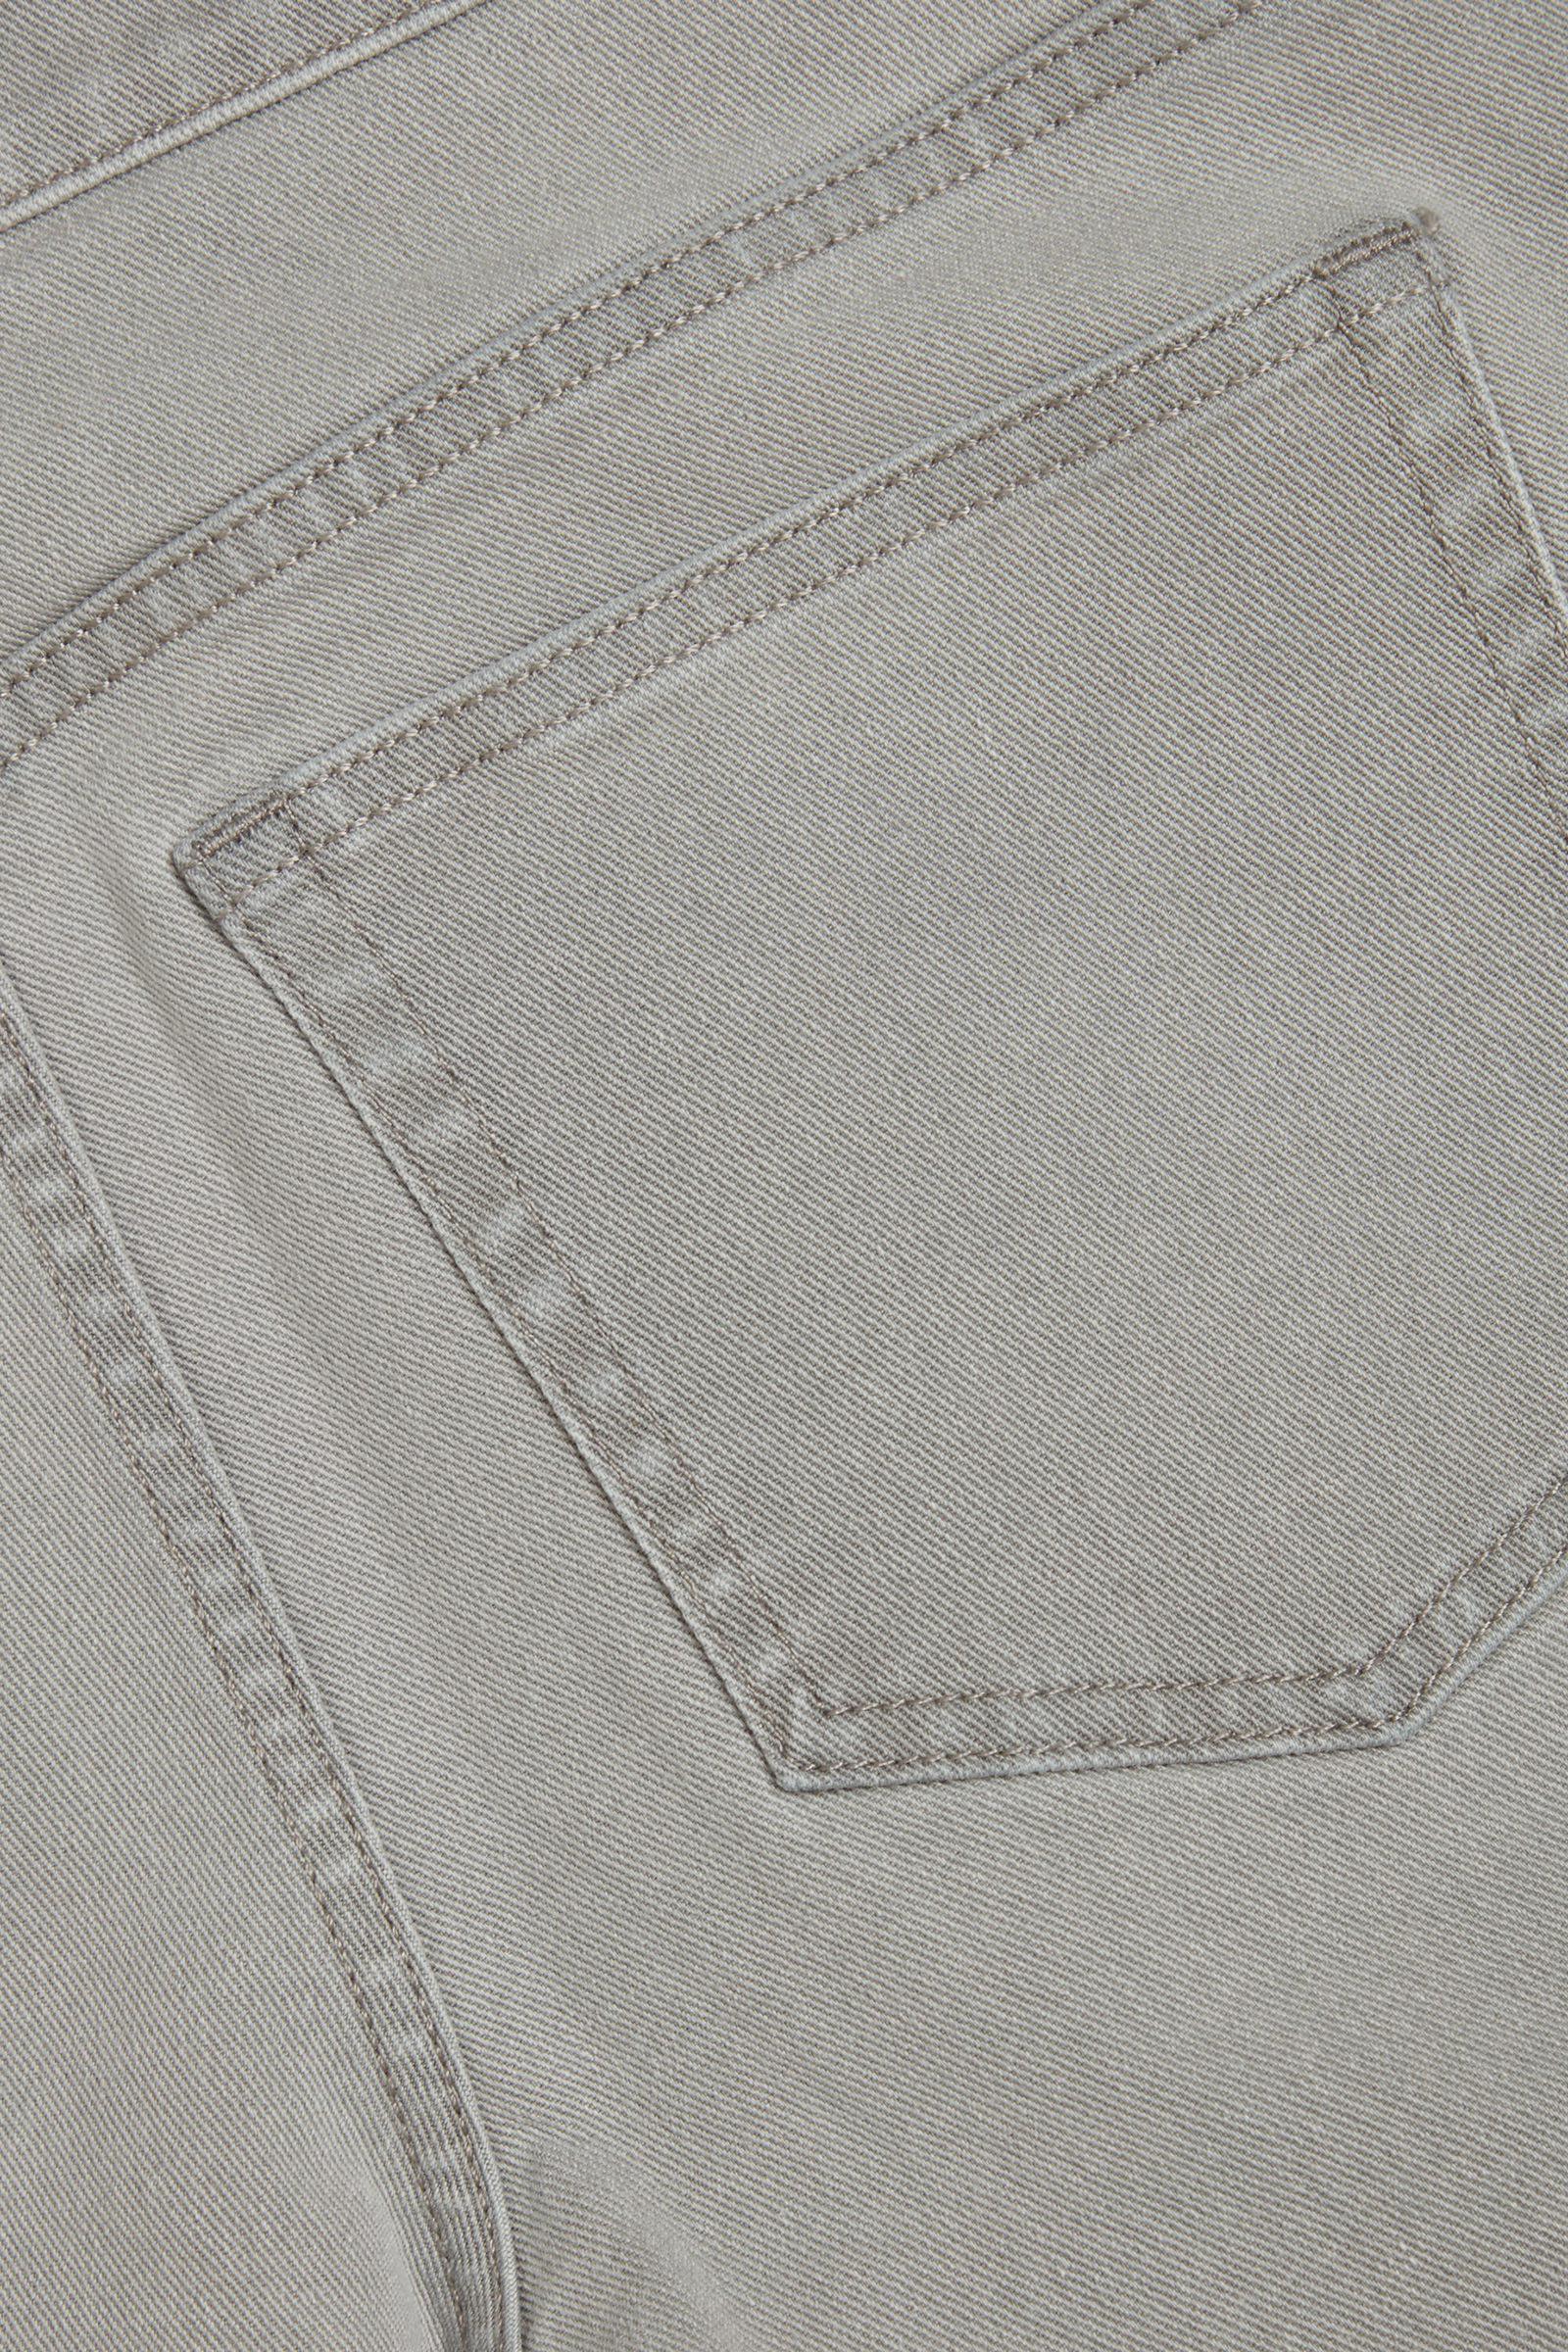 COS 슬림 레그 진의 그레이컬러 Detail입니다.